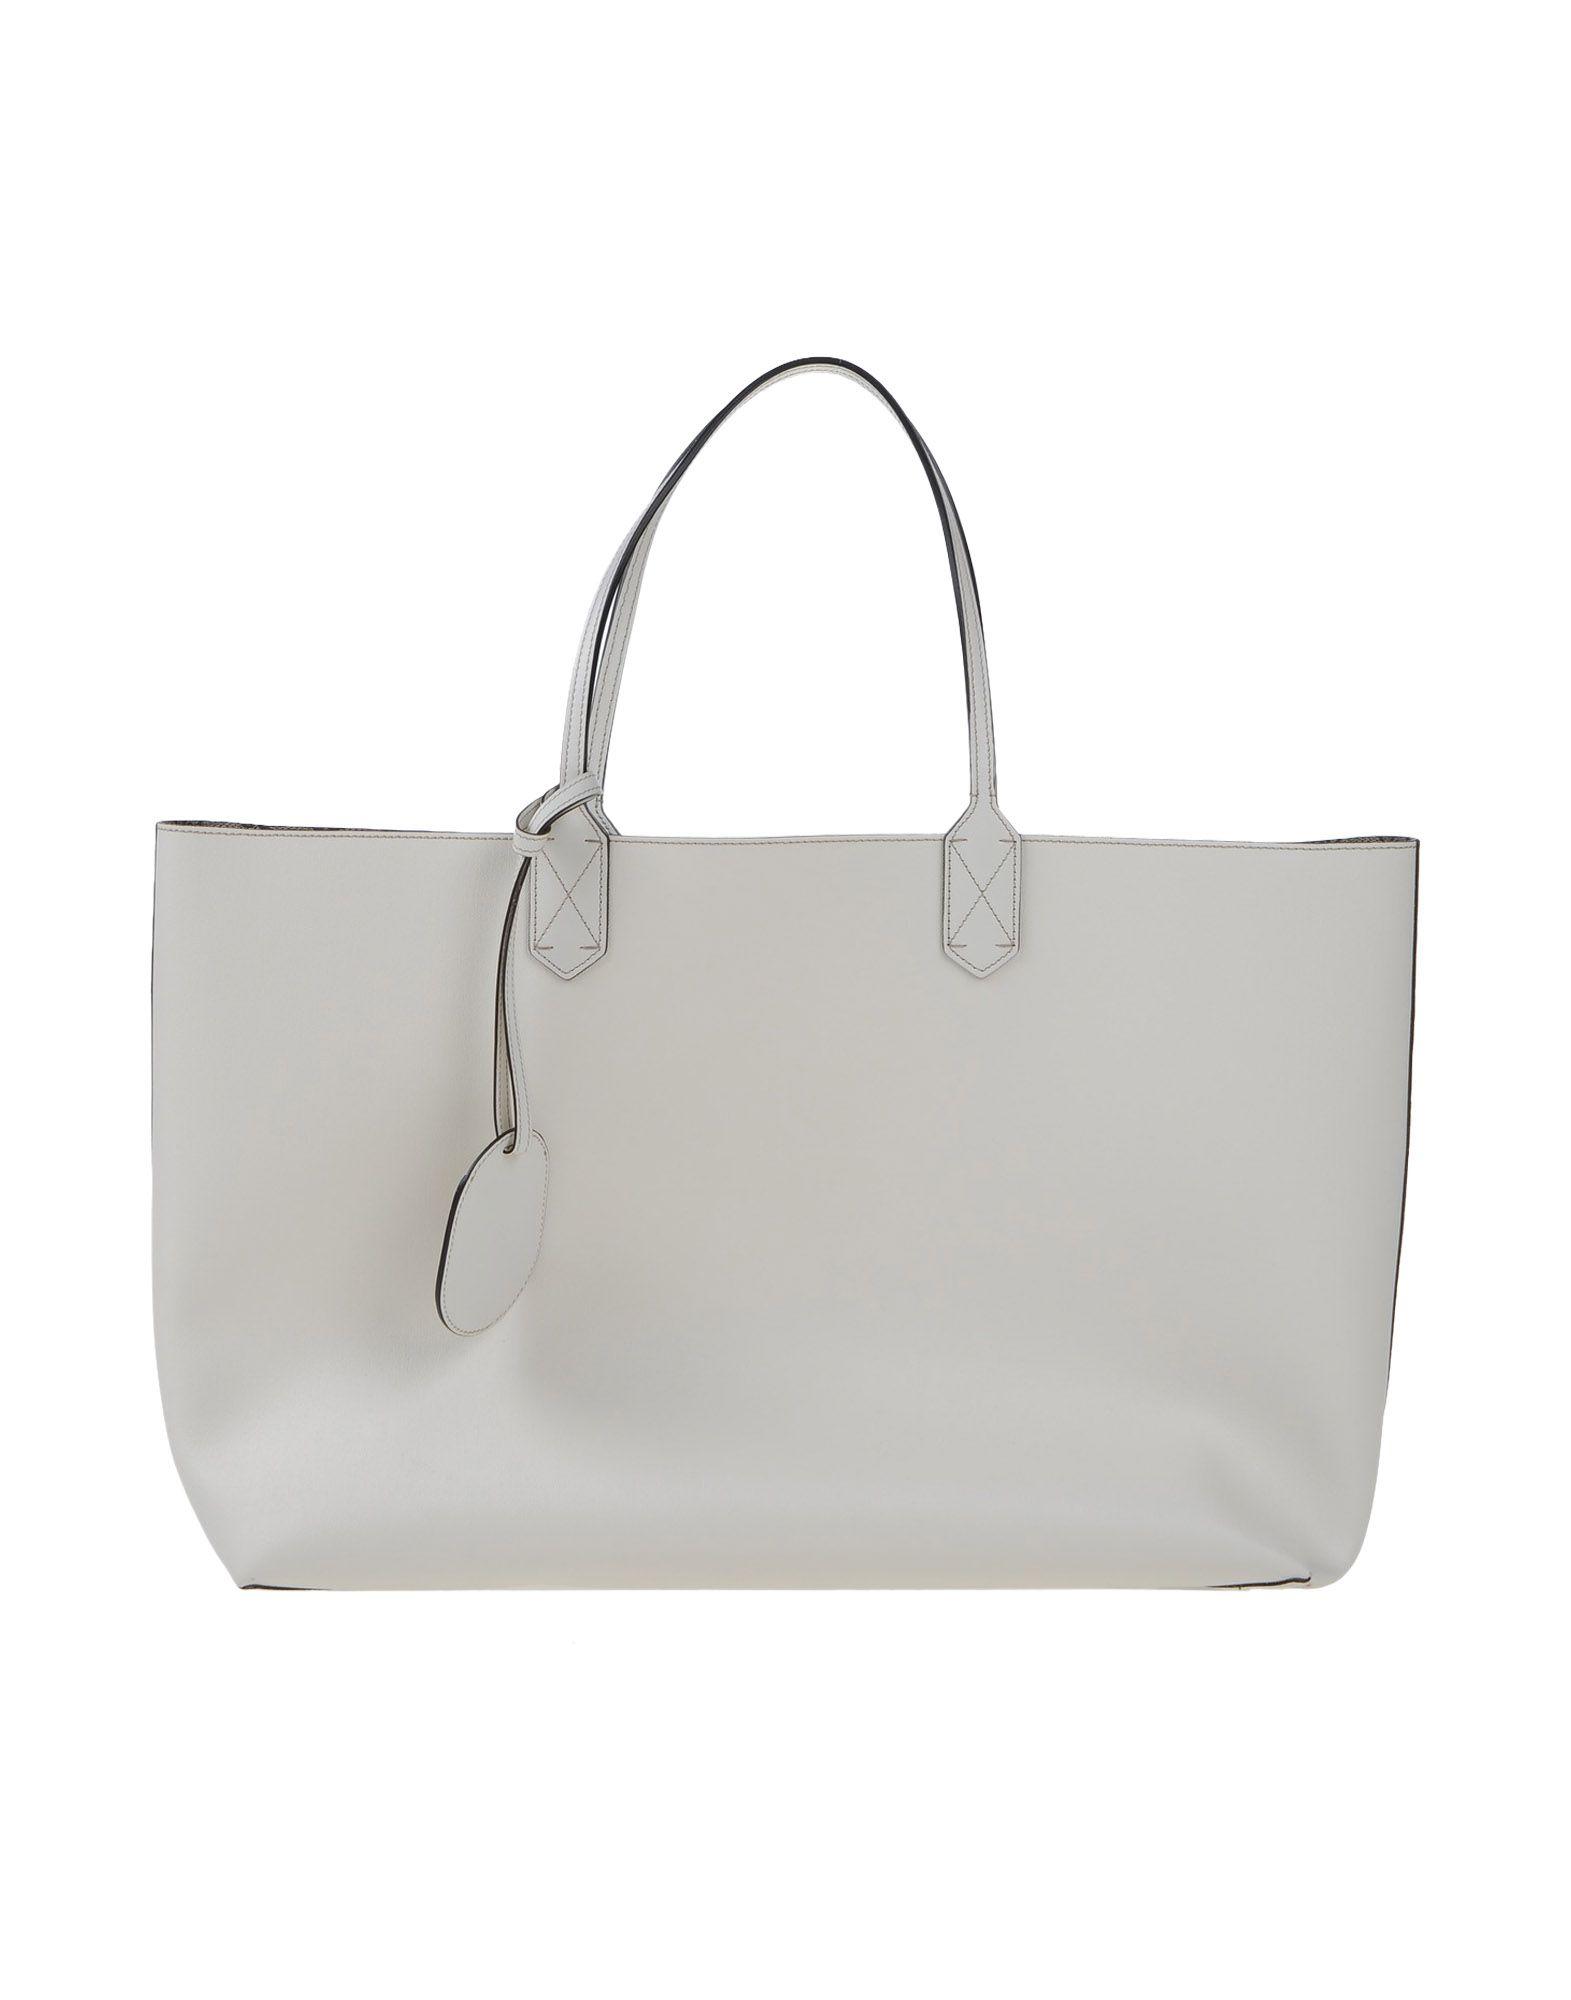 Celebrity badgley mischka handbag